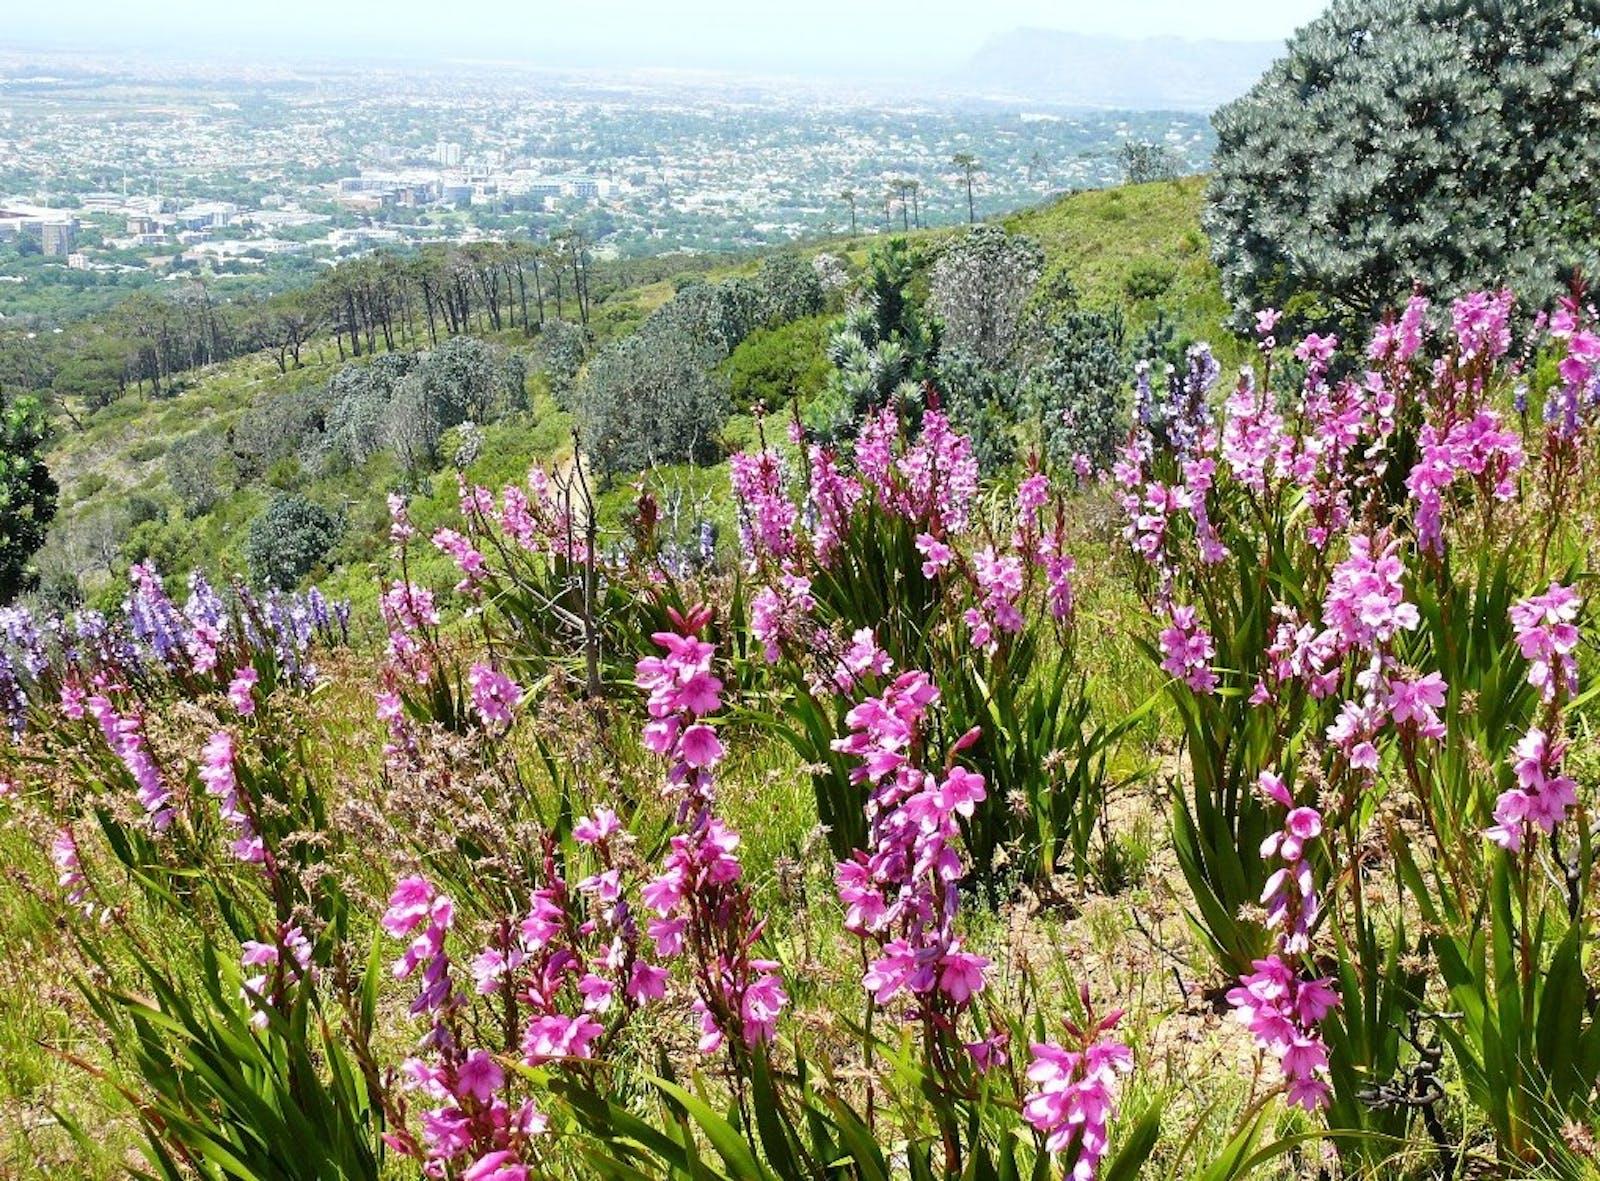 Fynbos Shrubland